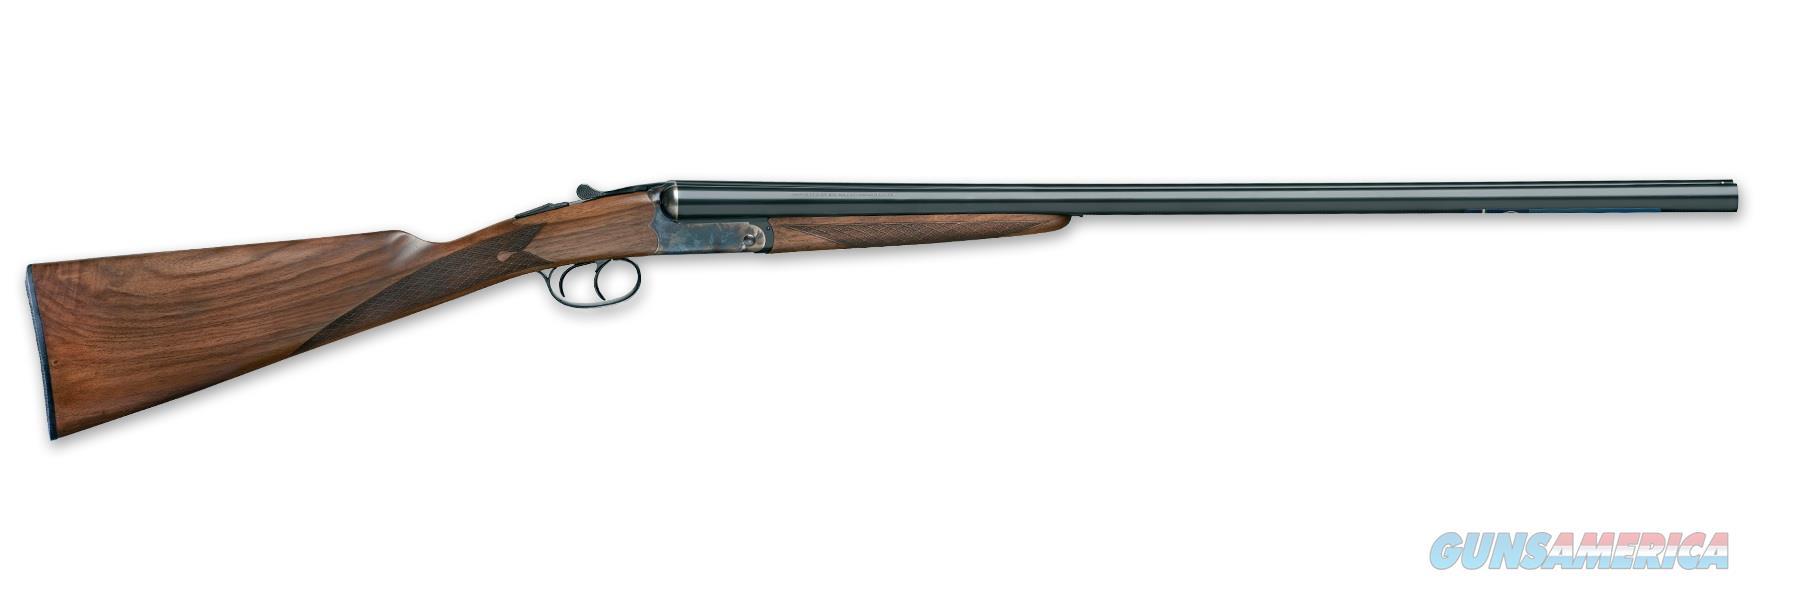 "Italian Firearms F.A.I.R. Iside 28 Gauge 28"" Walnut Double Trigger  Guns > Shotguns > Rizzini Shotguns"